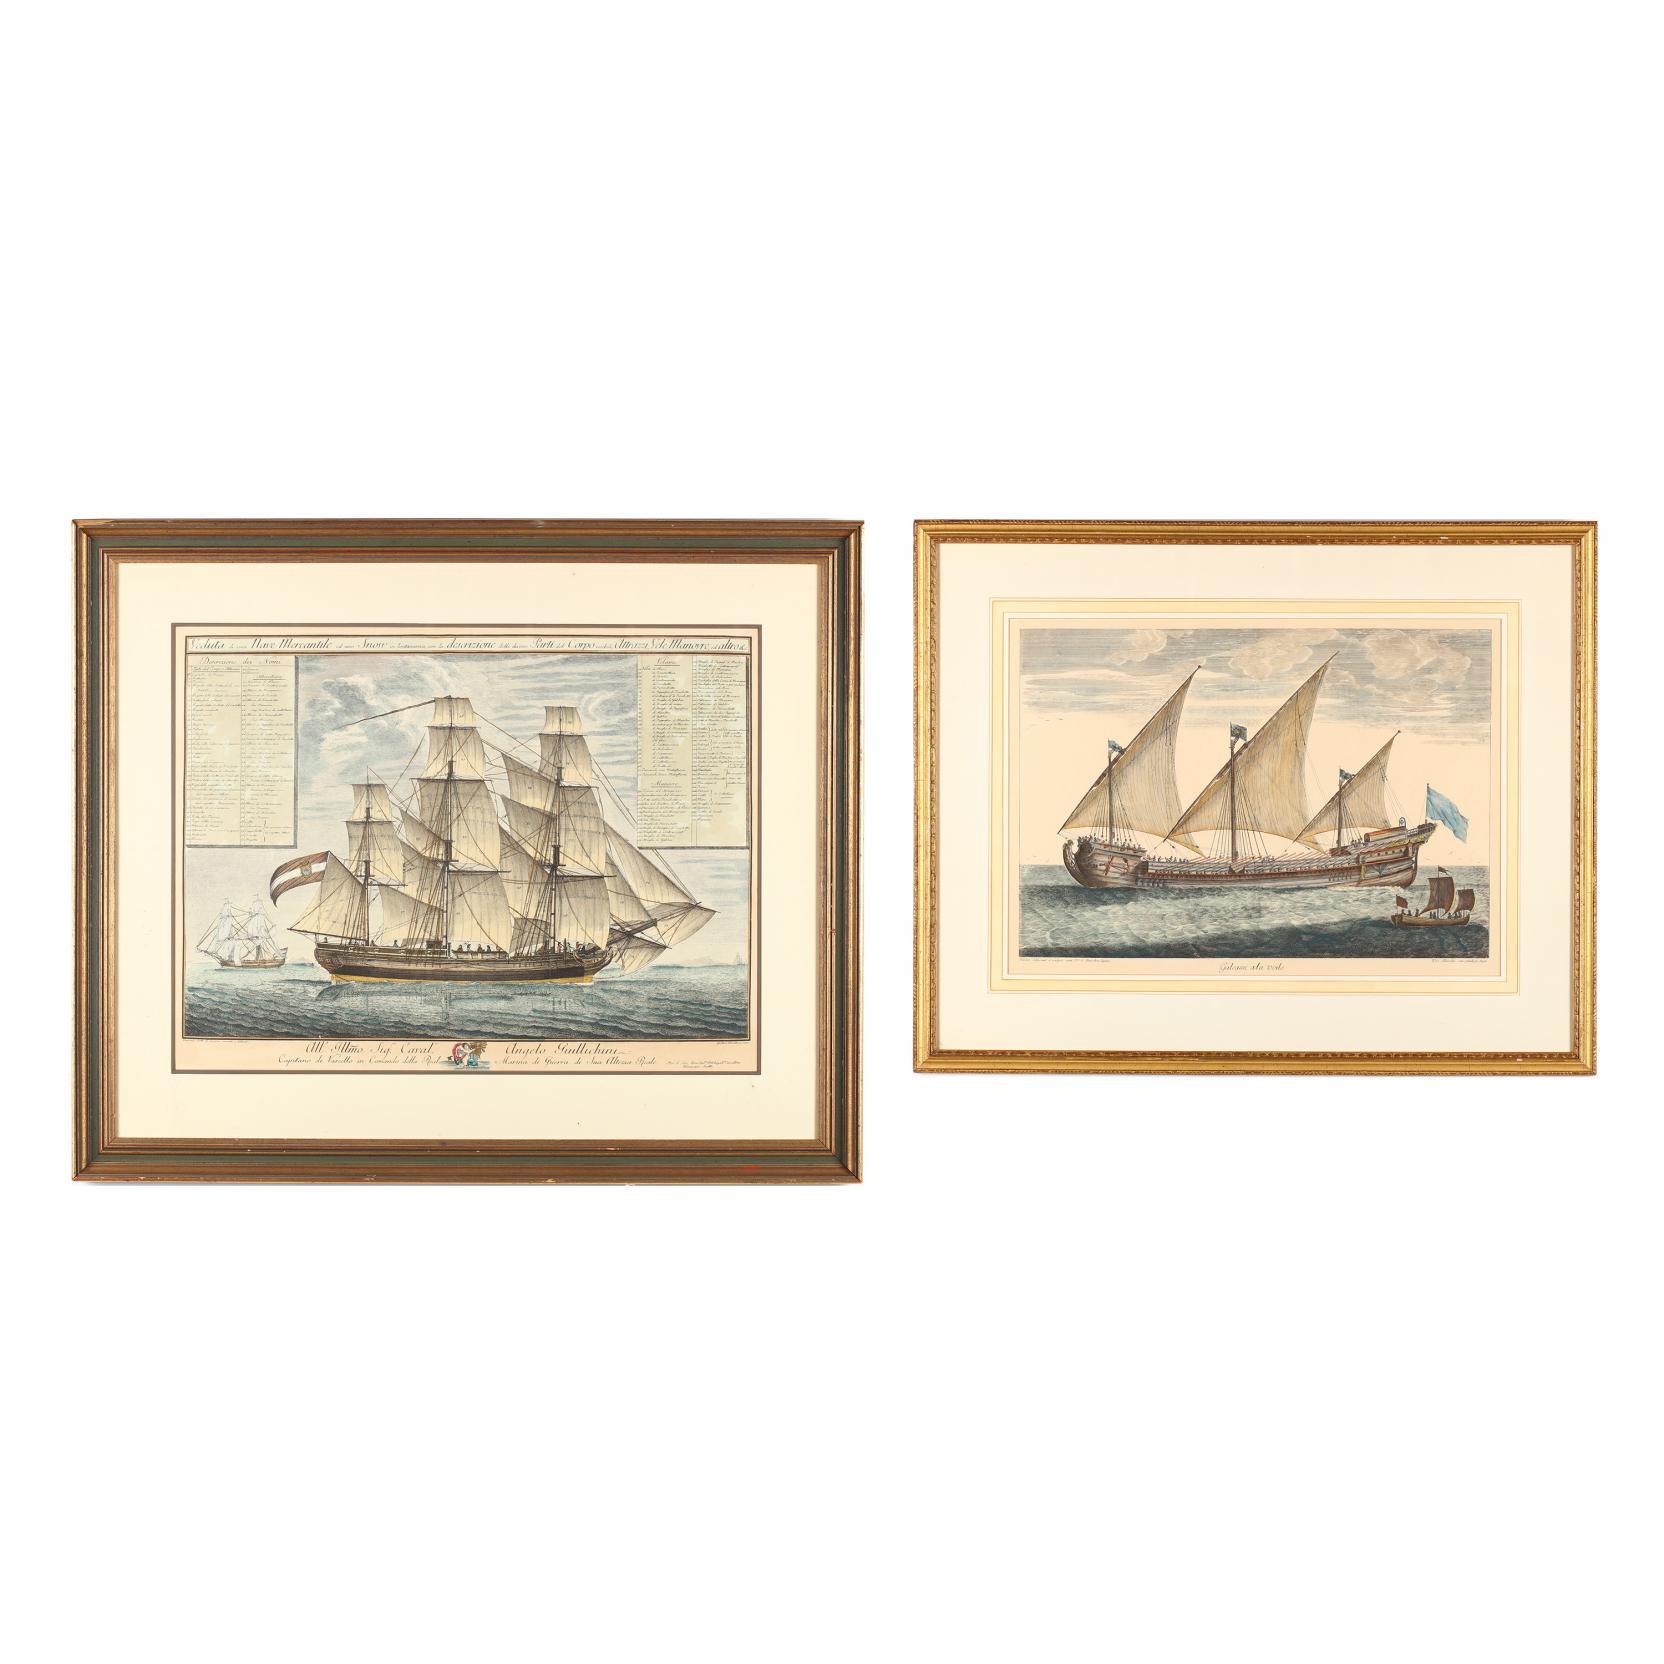 two-nautical-engravings-illustrating-italian-vessels